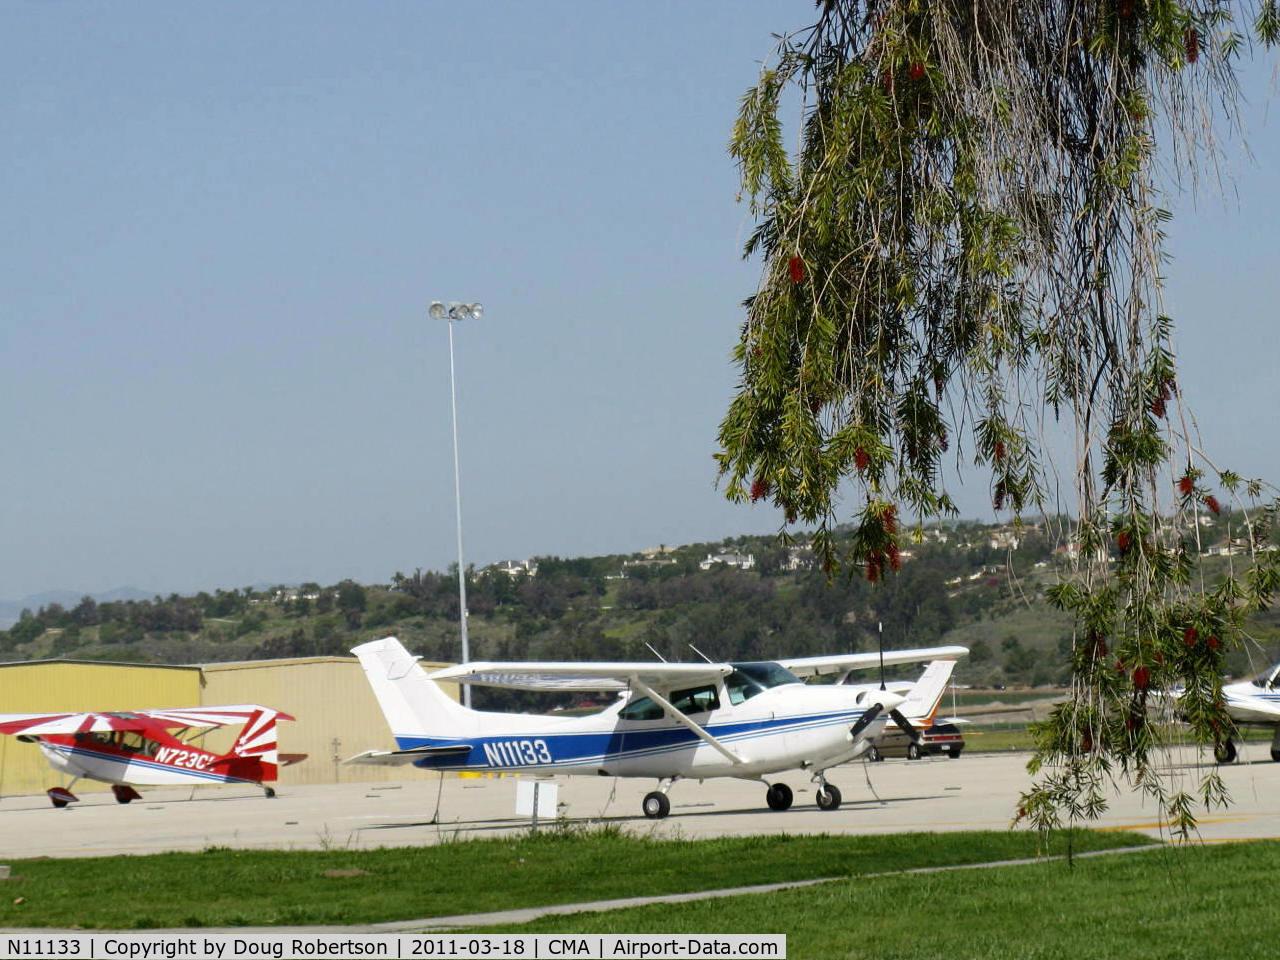 N11133, Cessna R182 Skylane RG C/N R18201943, Cessna R182 SKYLANE RG, Lycoming O-540-J3C5D 235 Hp, retractable gear